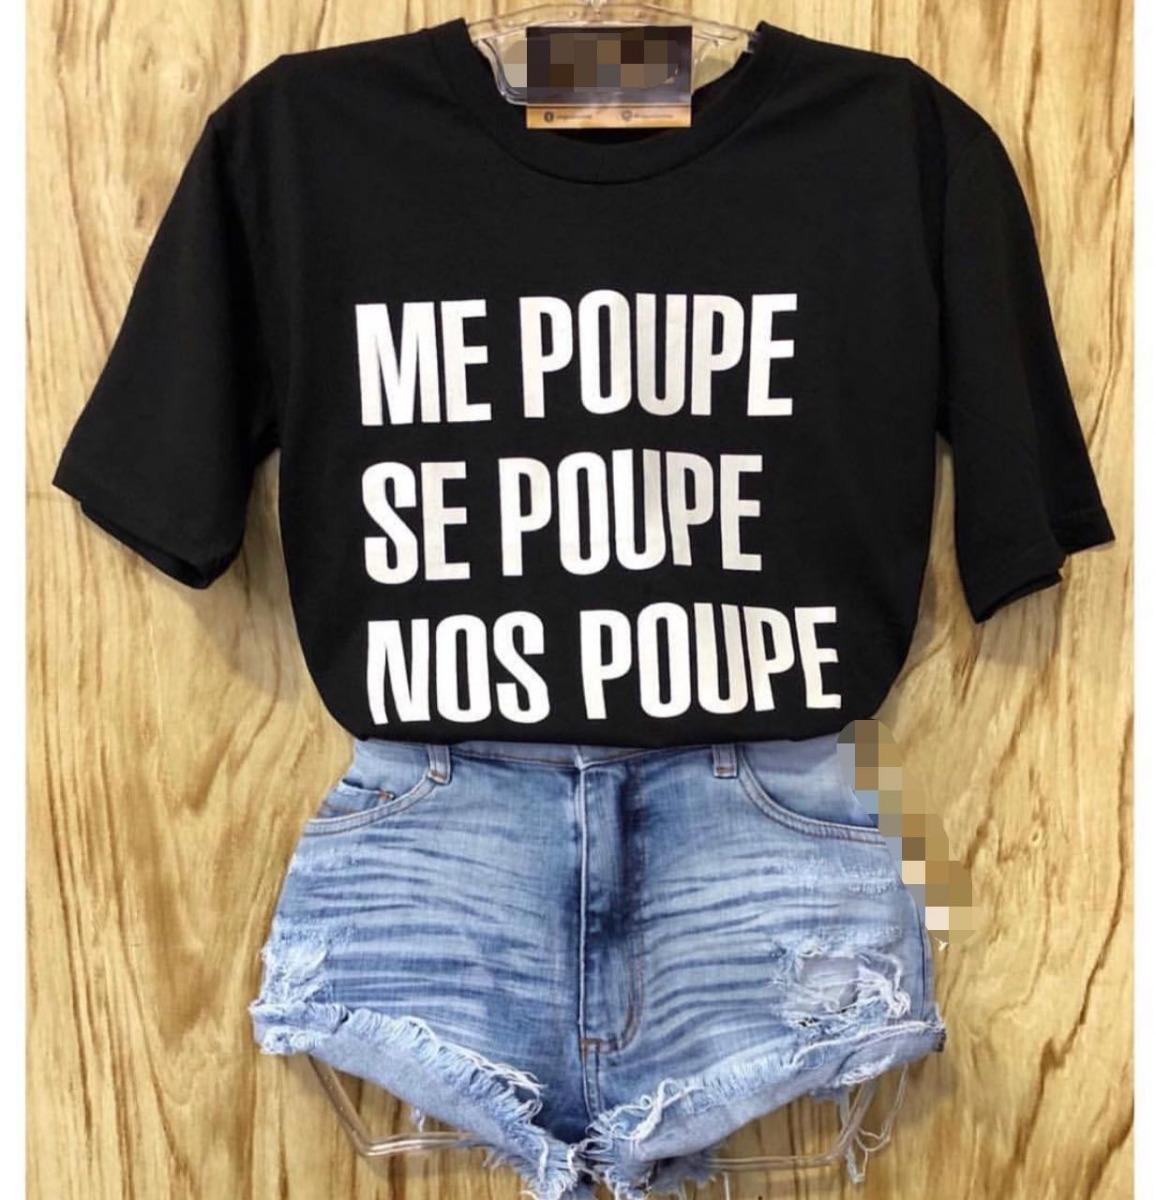 ecc5a1d84 Tshirts Blusa Feminina   me Poupe Se Poupe Nos Poupe Único - R  39 ...